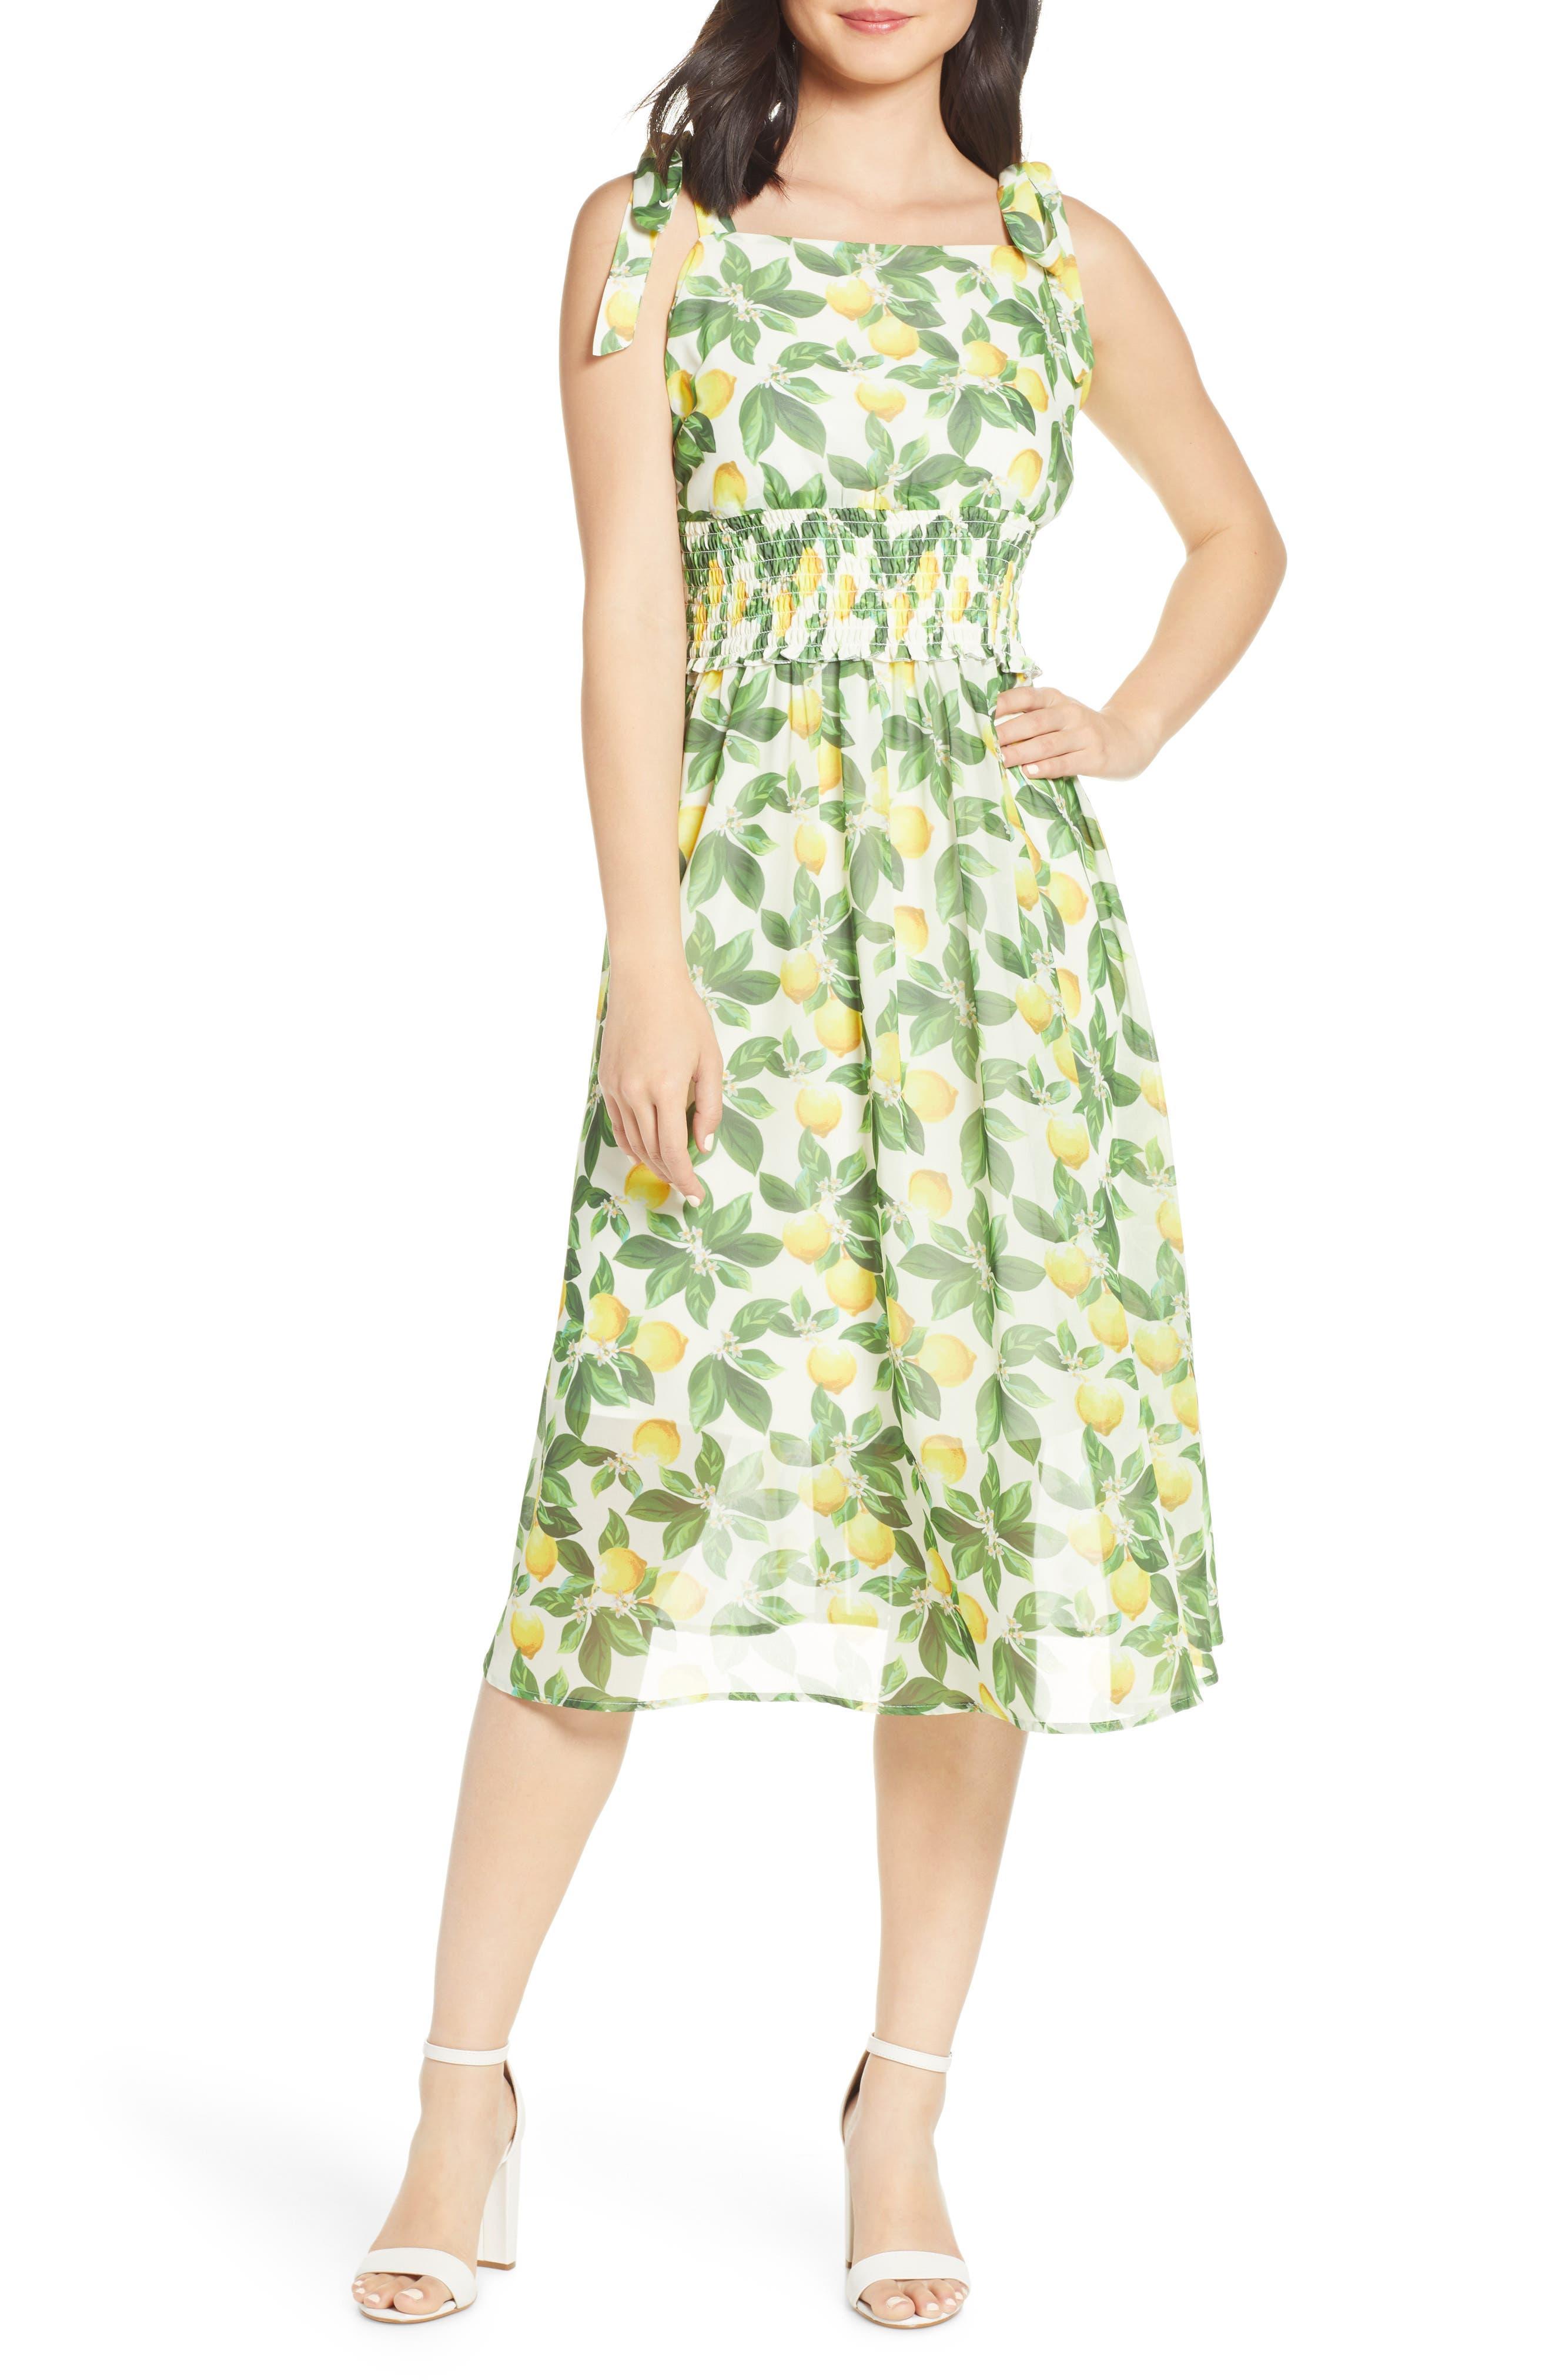 Sam Edelman Lemon Print Chiffon Sundress, Ivory